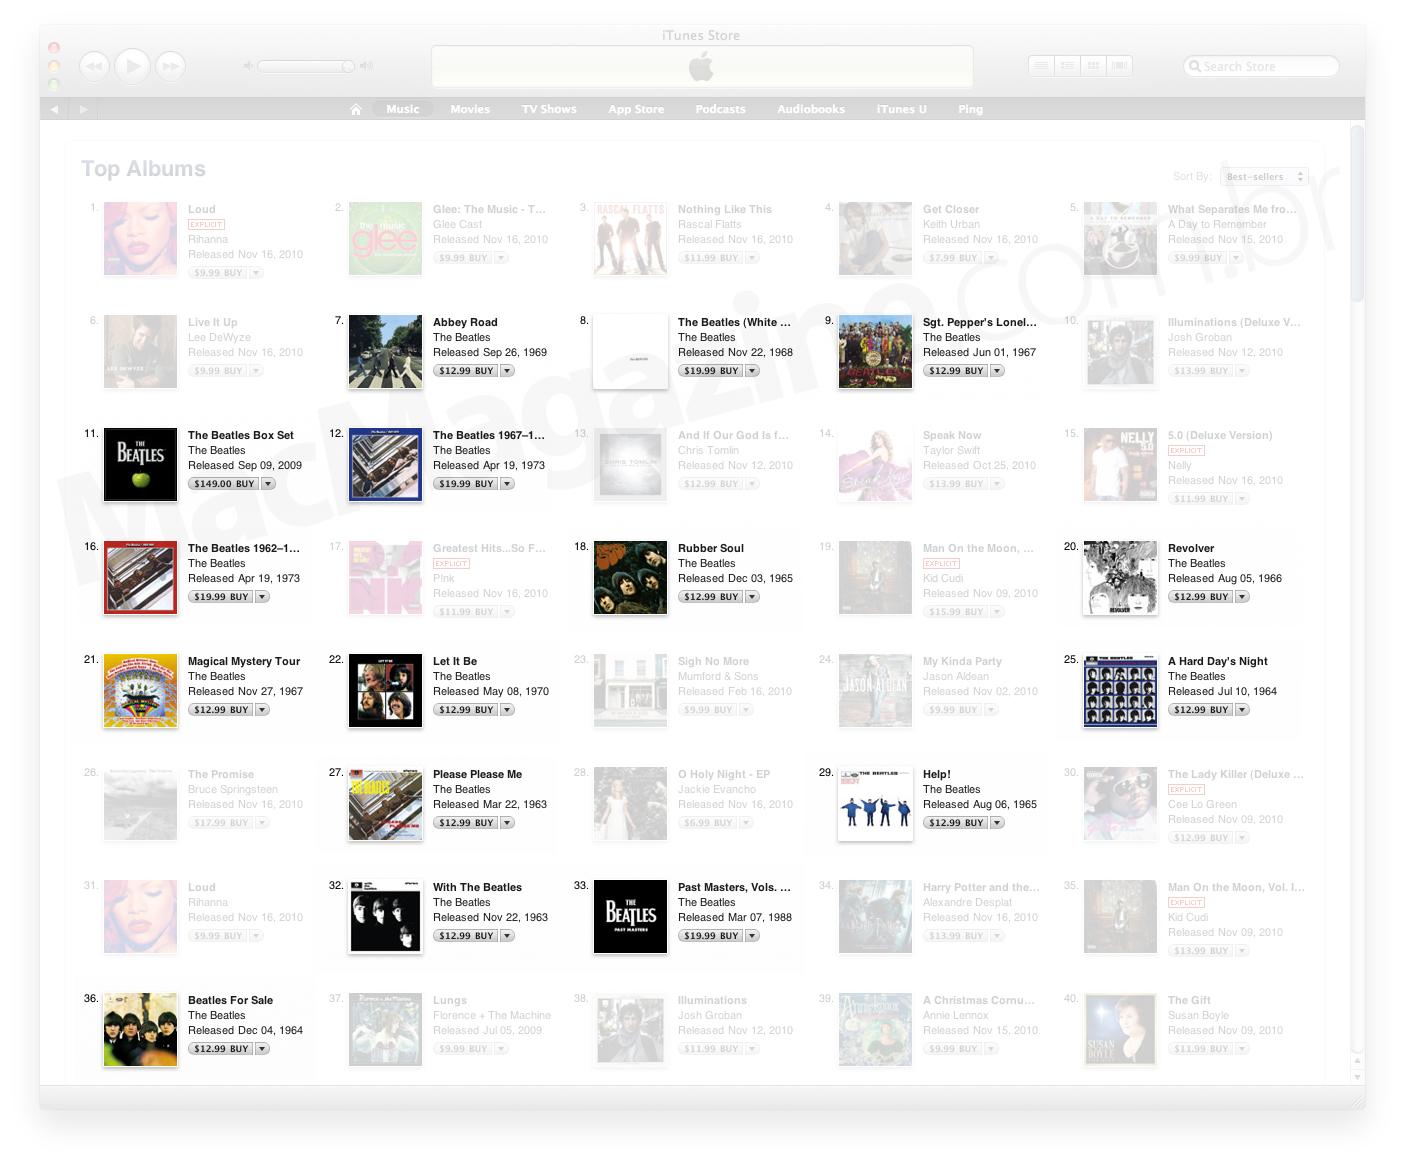 Beatles entre os mais populares da iTunes Store